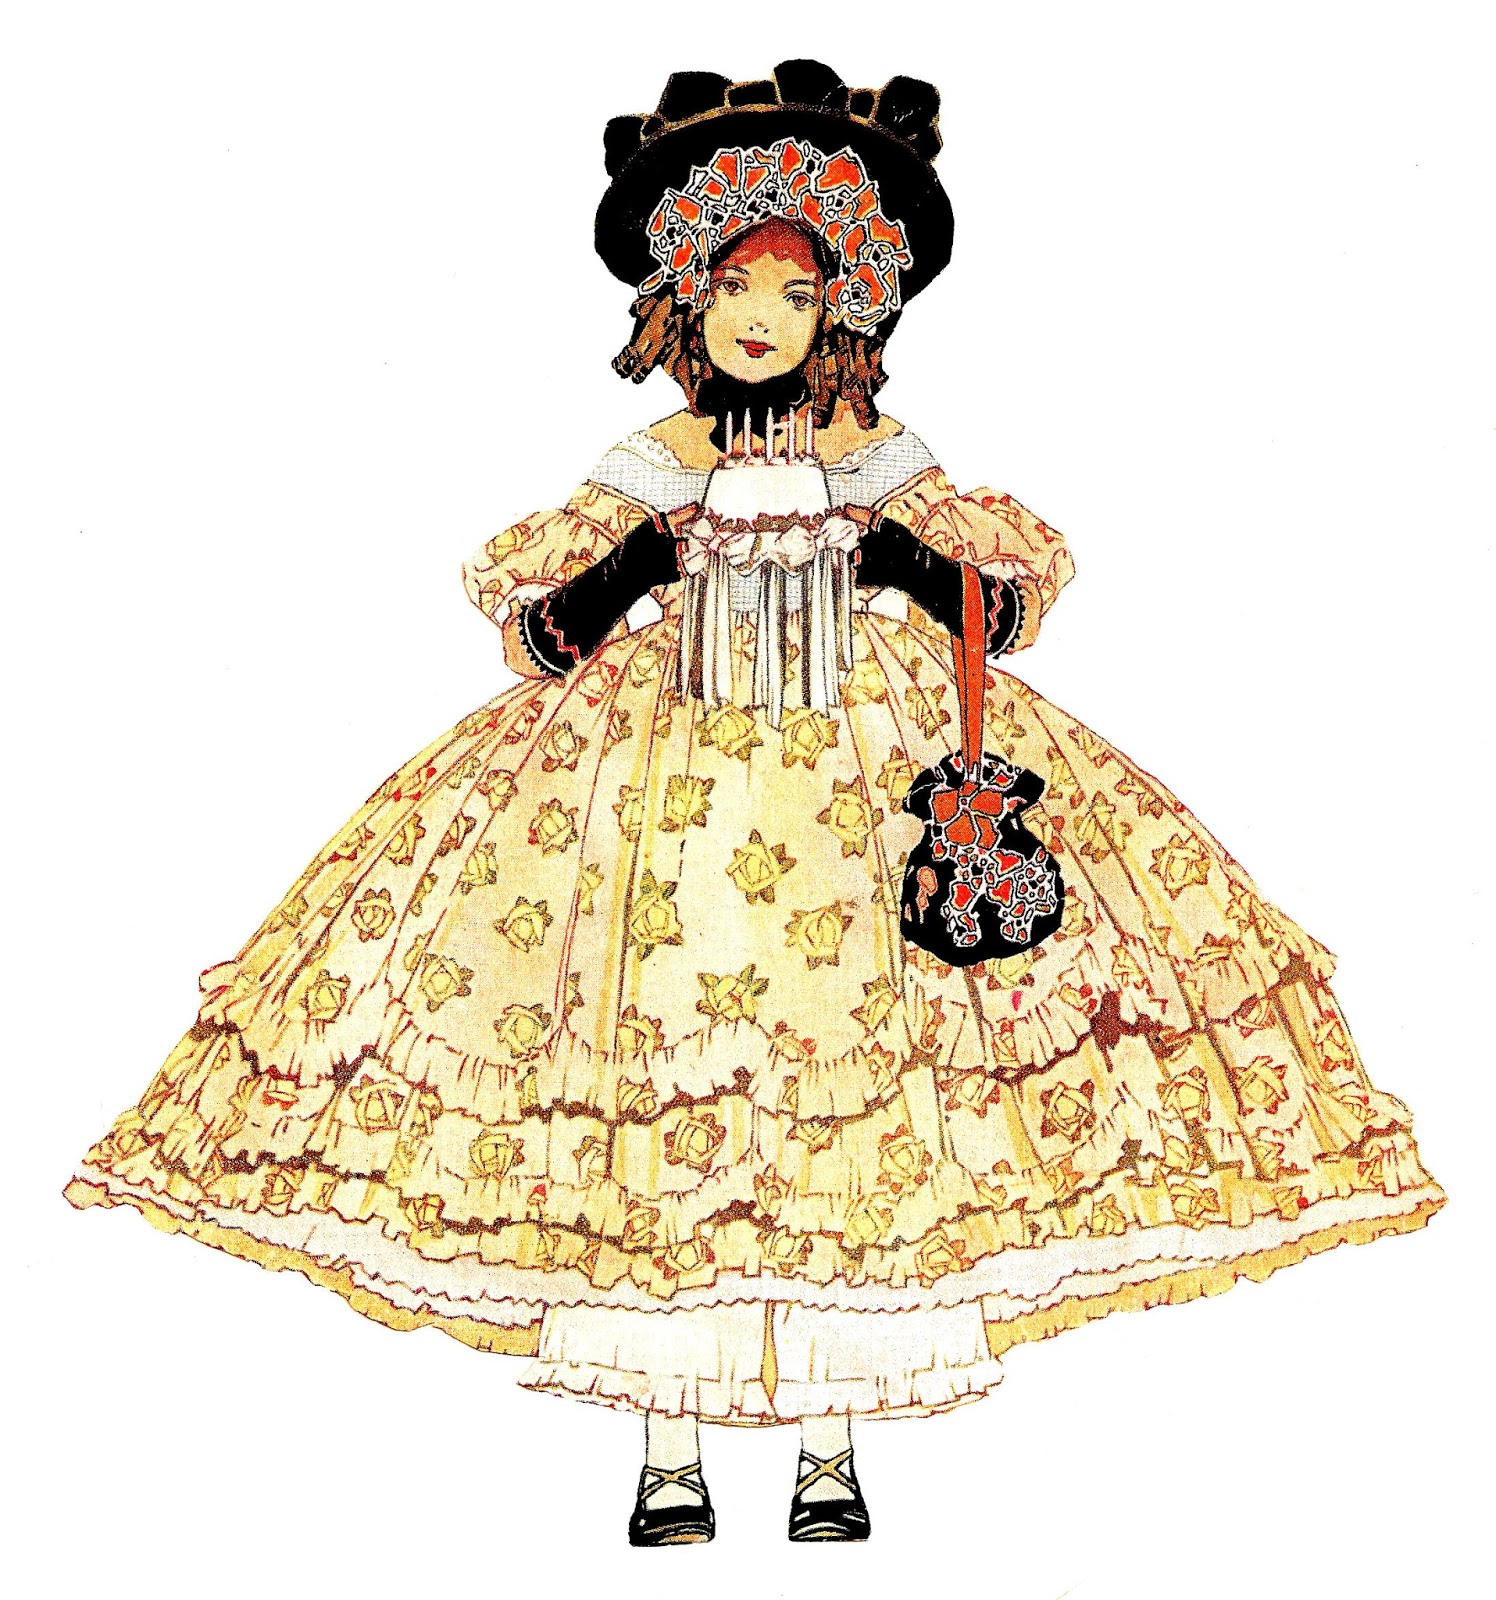 Cake clipart victorian. Antique images digital girl